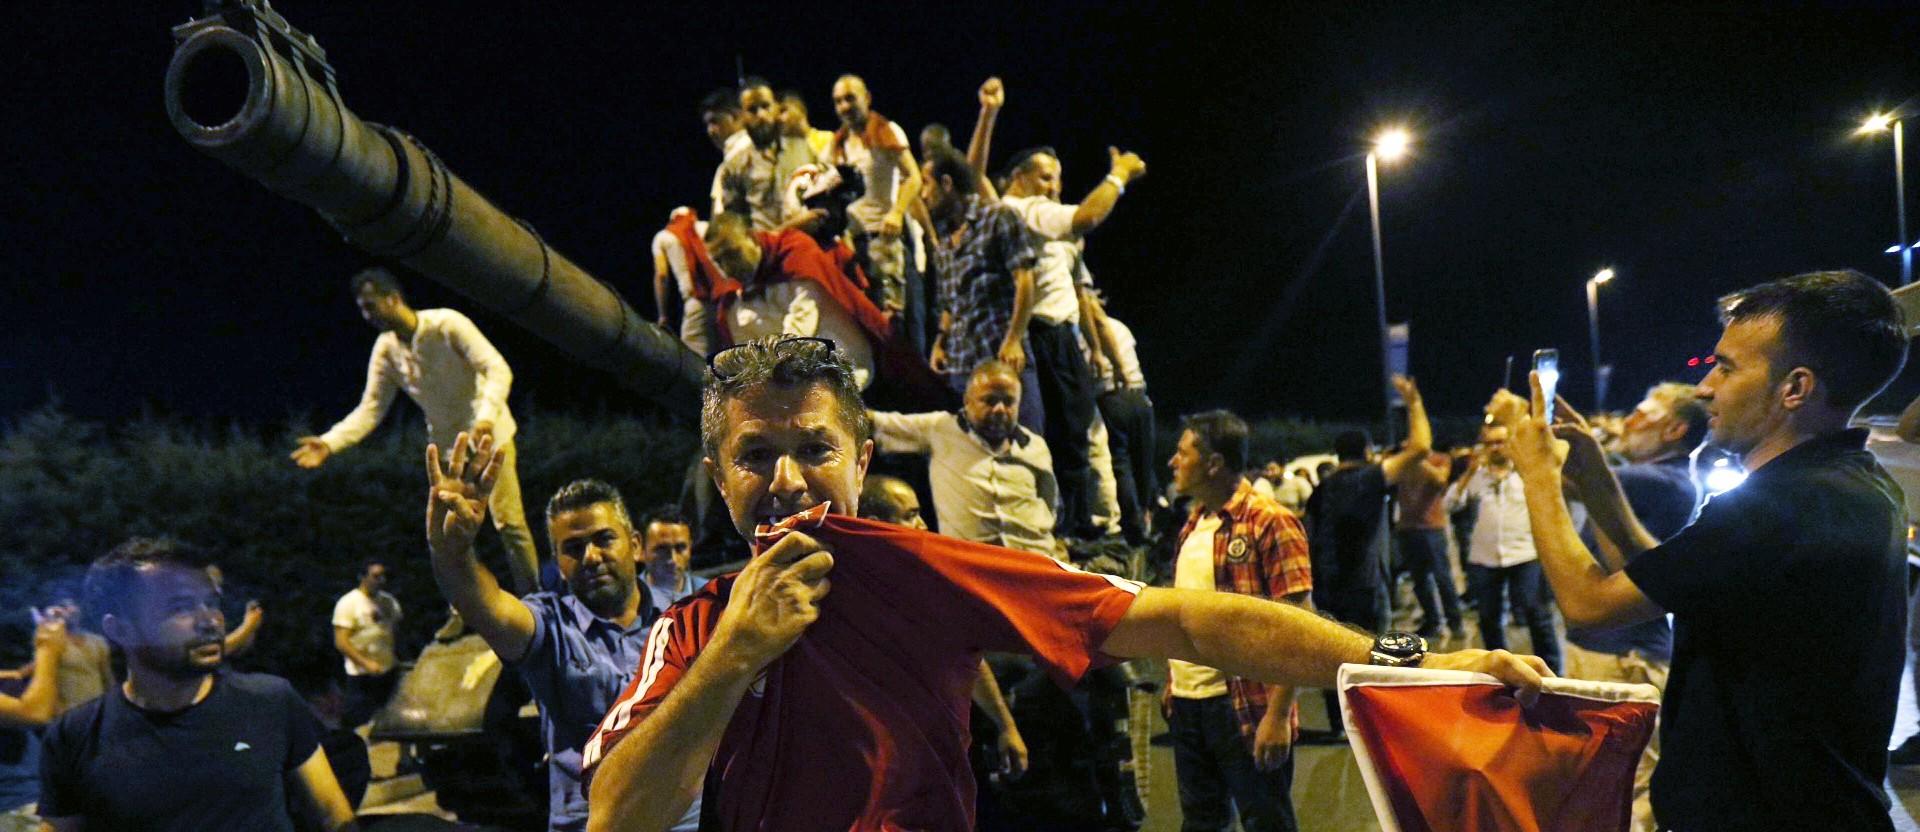 https://roarmag.org/wp-content/uploads/2016/07/TurkeyCoupTank4-1920x832.jpg